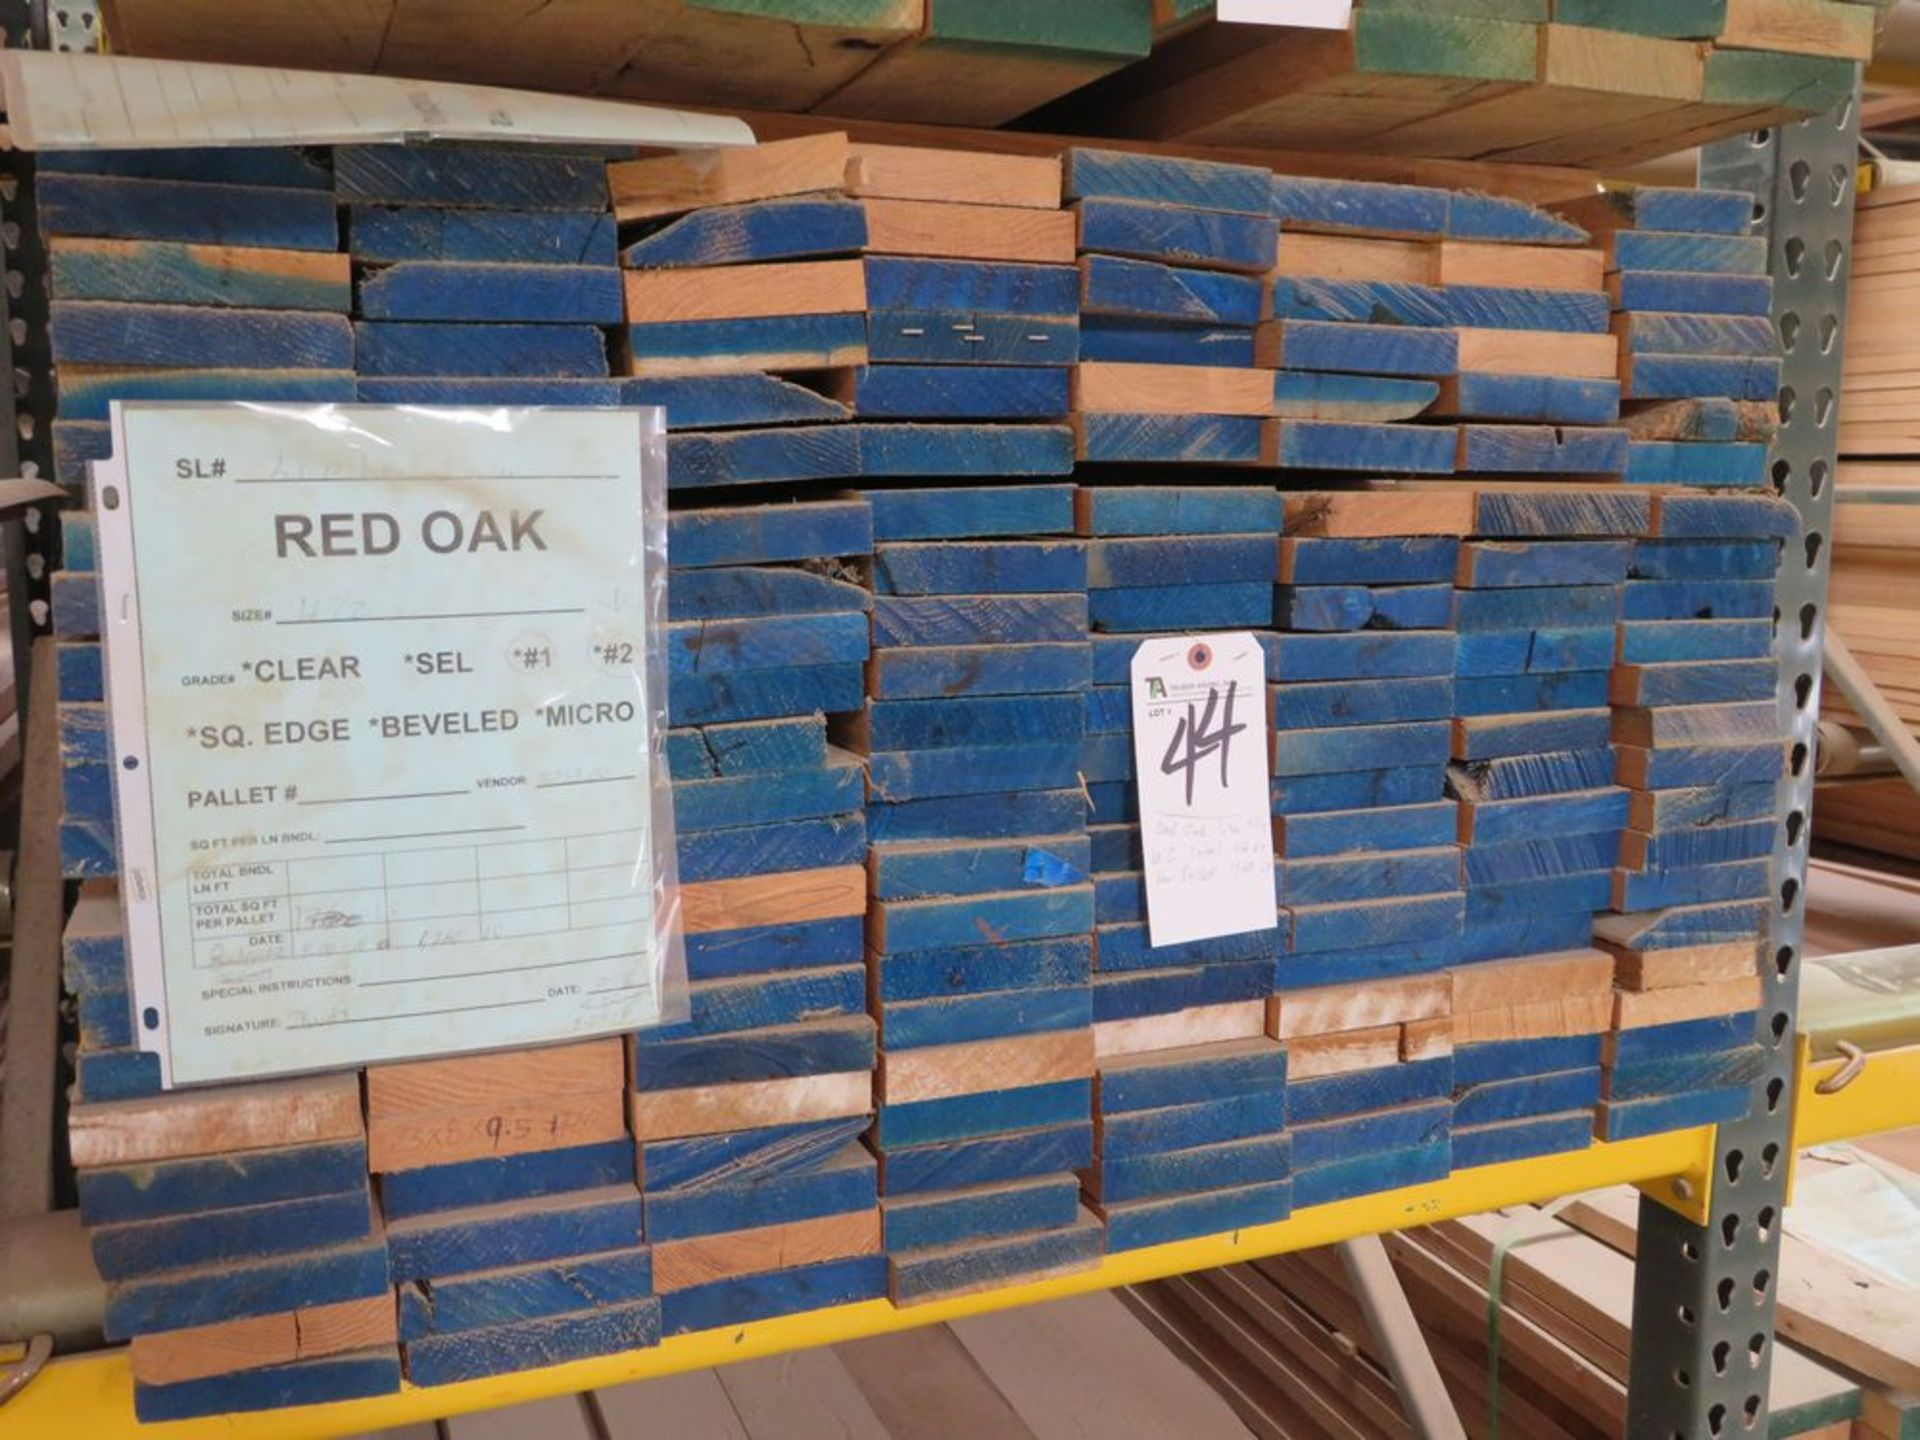 Lot 44 - (Lot) Red Oak #1-#2 Straight Line, S4S